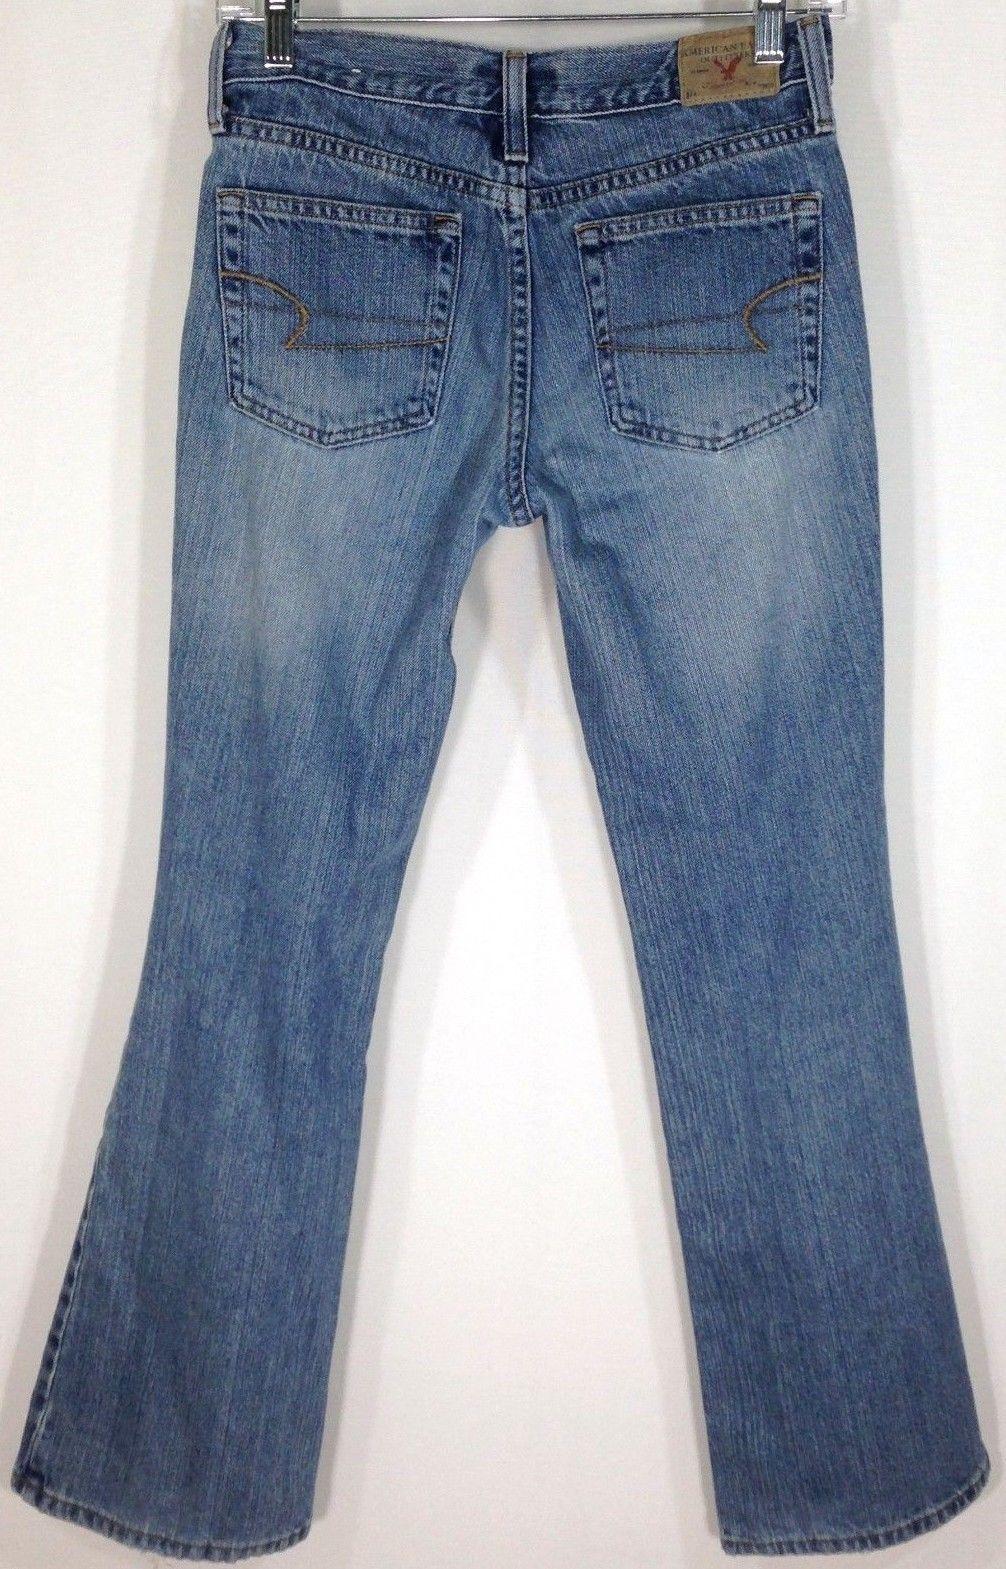 half off 38f6d 910fe 22.00 USD  American Eagle Womens Size 2 Petites Medium Wash Low Rise  Flare Denim Jeans